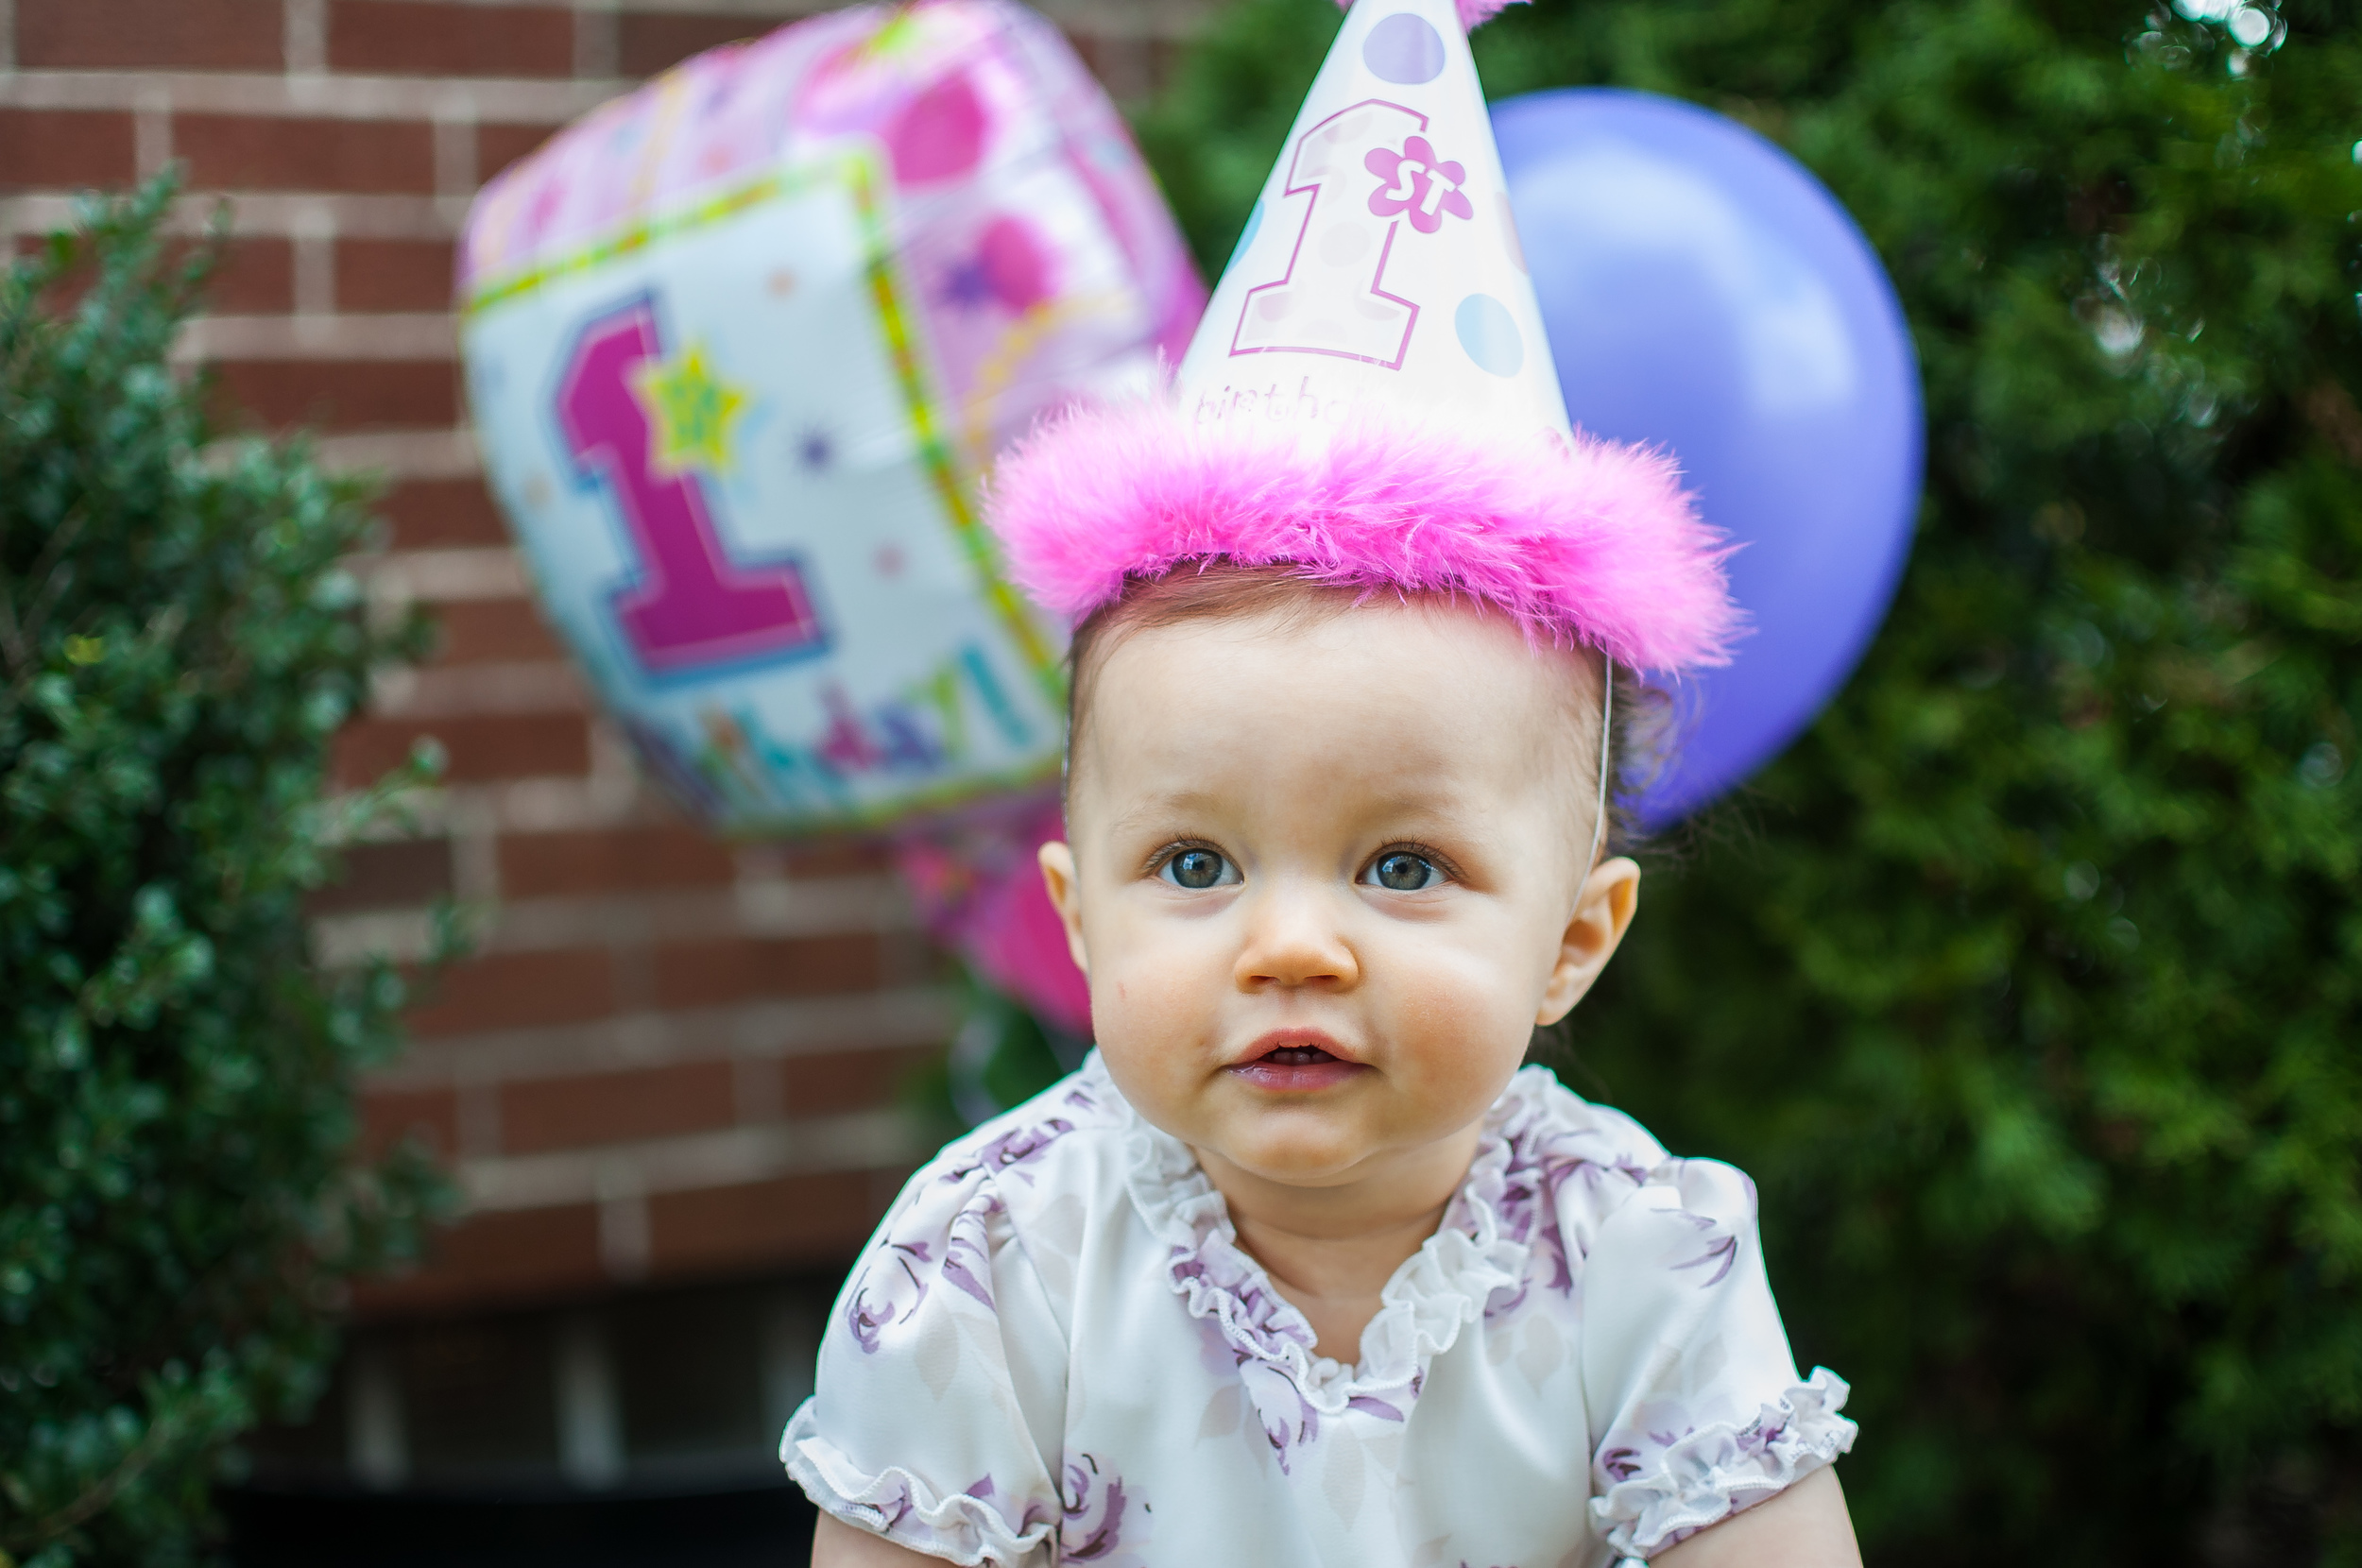 131117 - Kerrigan's First Birthday-32.jpg